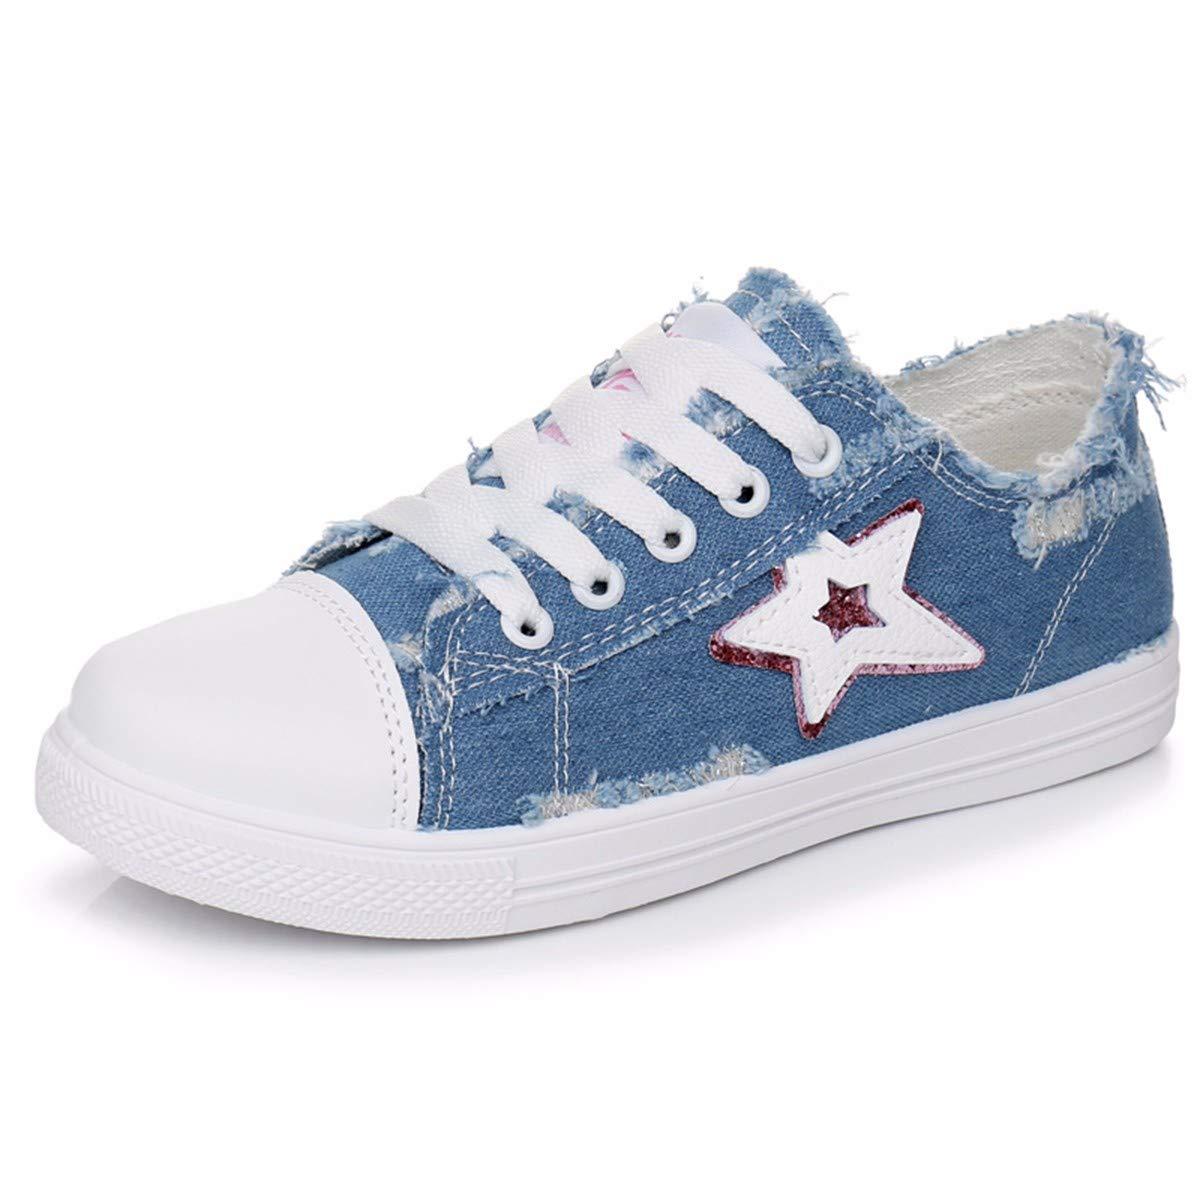 GTVERNH Damenschuhe Mode Löcher Jeans Leinwand Schuhe Studenten - Vorstand Schuhe Im Frühling und Sommer Einzelne Schuhe Spitzen Sportschuhe Damenschuhe.